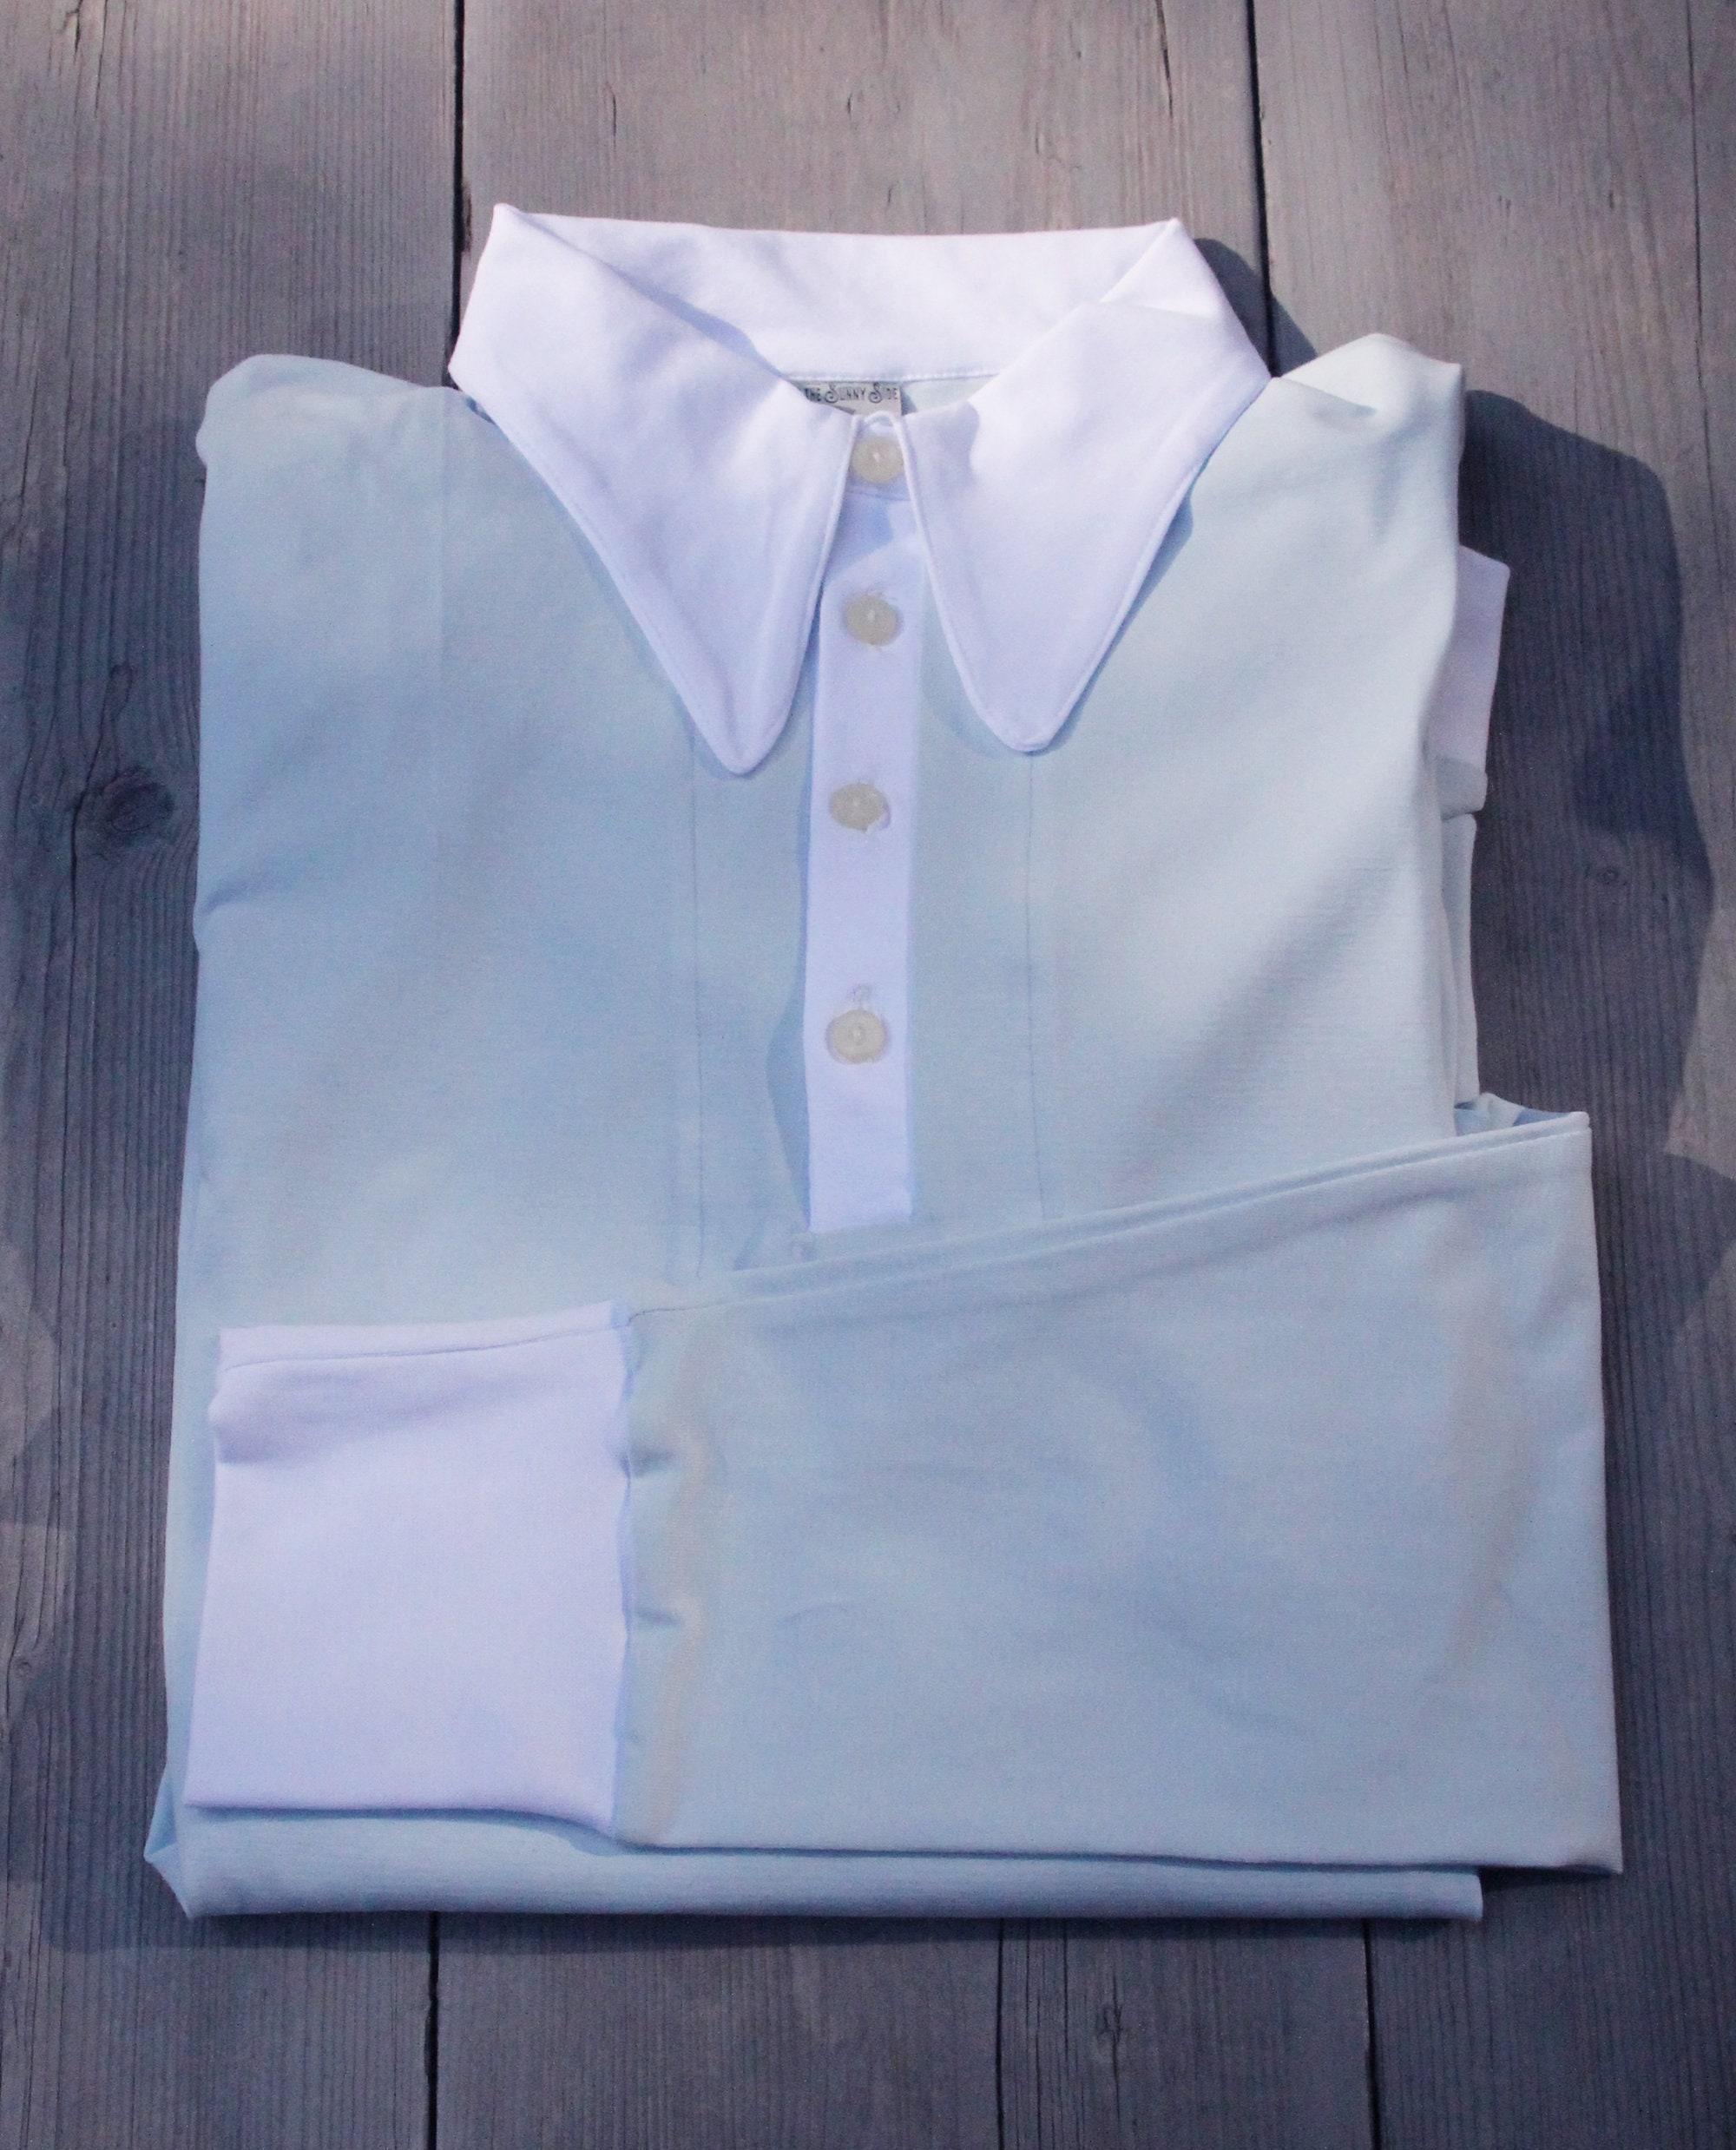 1940s Men's Shirts, Sweaters, Vests 1940S Mens Polo, Longsleeve Polo Shirt, Lindy Hop Mens, Spearpoint Collar Vintage 1930S Shirt $108.46 AT vintagedancer.com